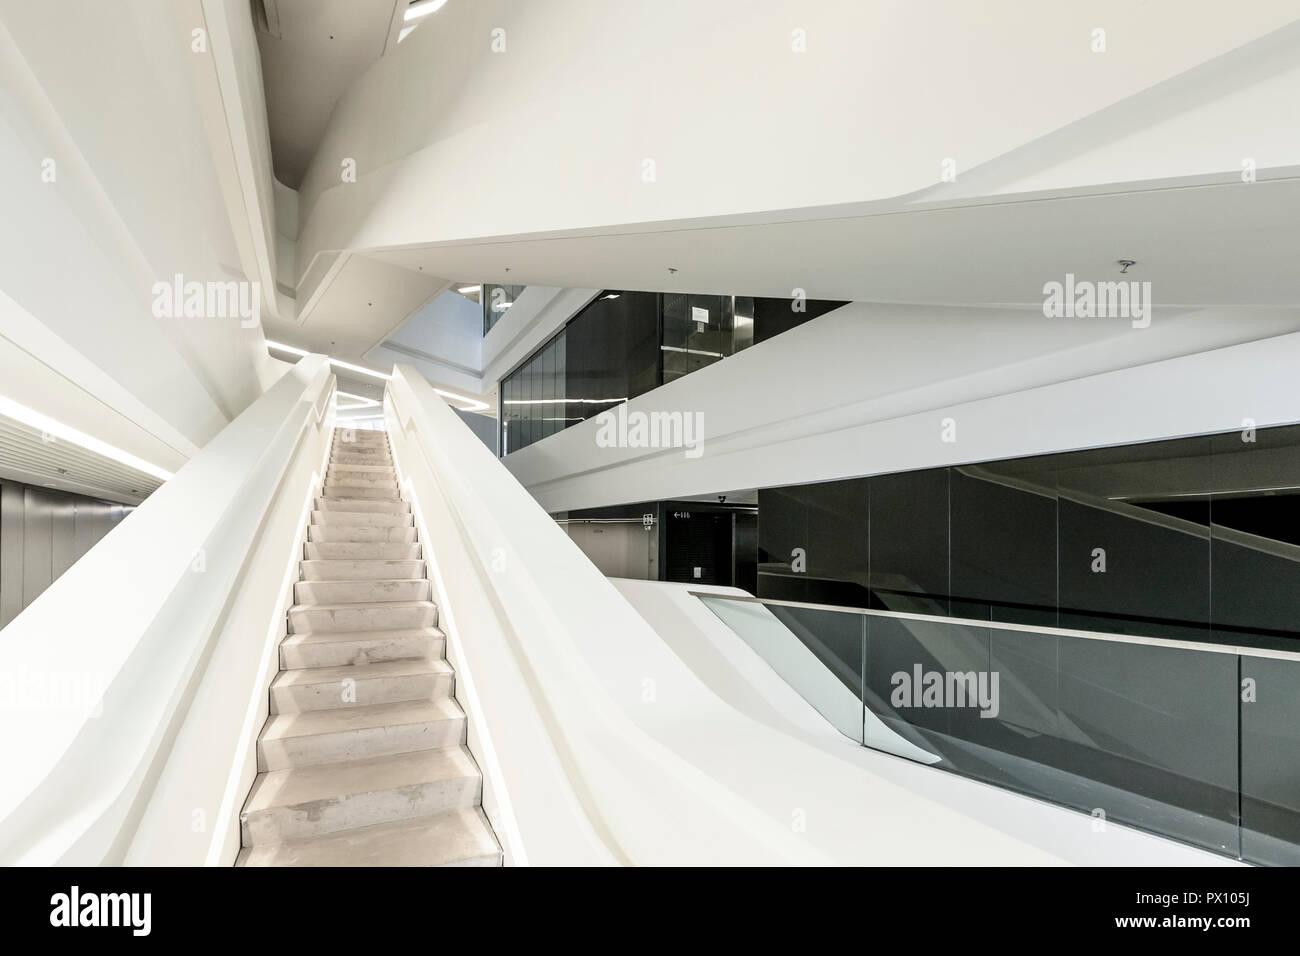 Interior view of the Jockey Club Innovation Tower, a building of the Hong Kong Polytechnic University, Hong Kong. Stock Photo